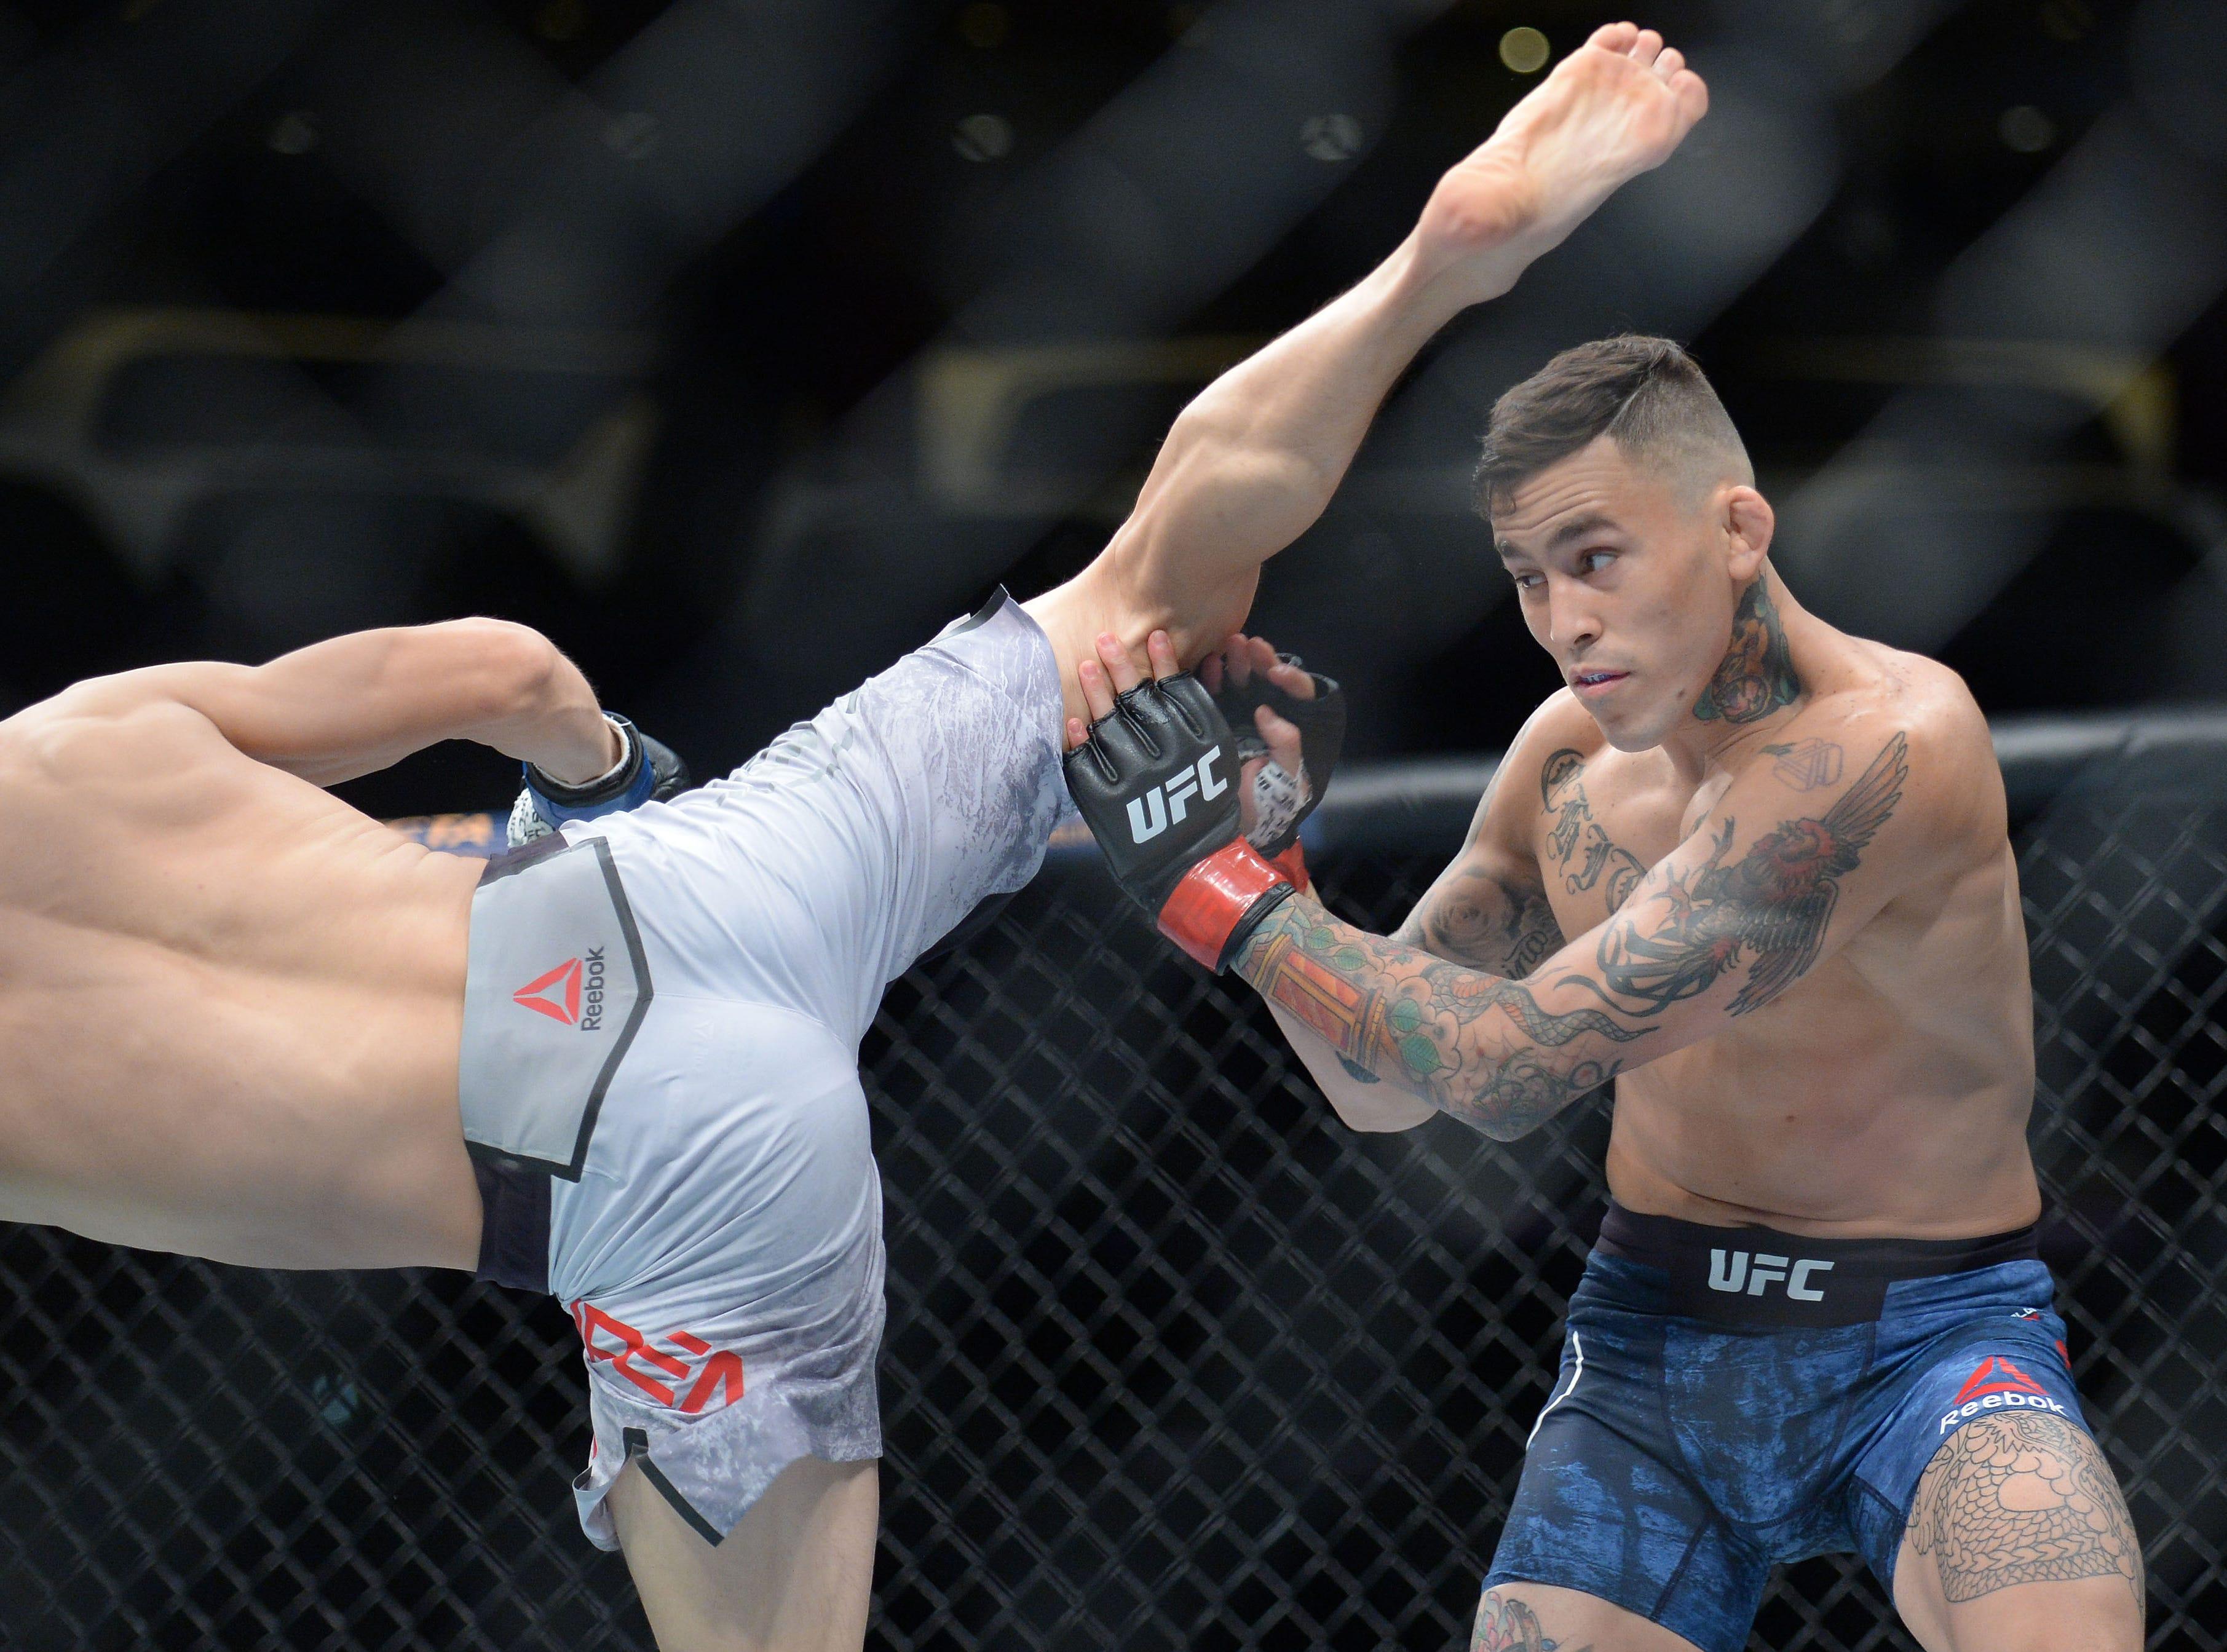 Marlon Vera defends against Wuliji Buren during UFC 227 at Staples Center.